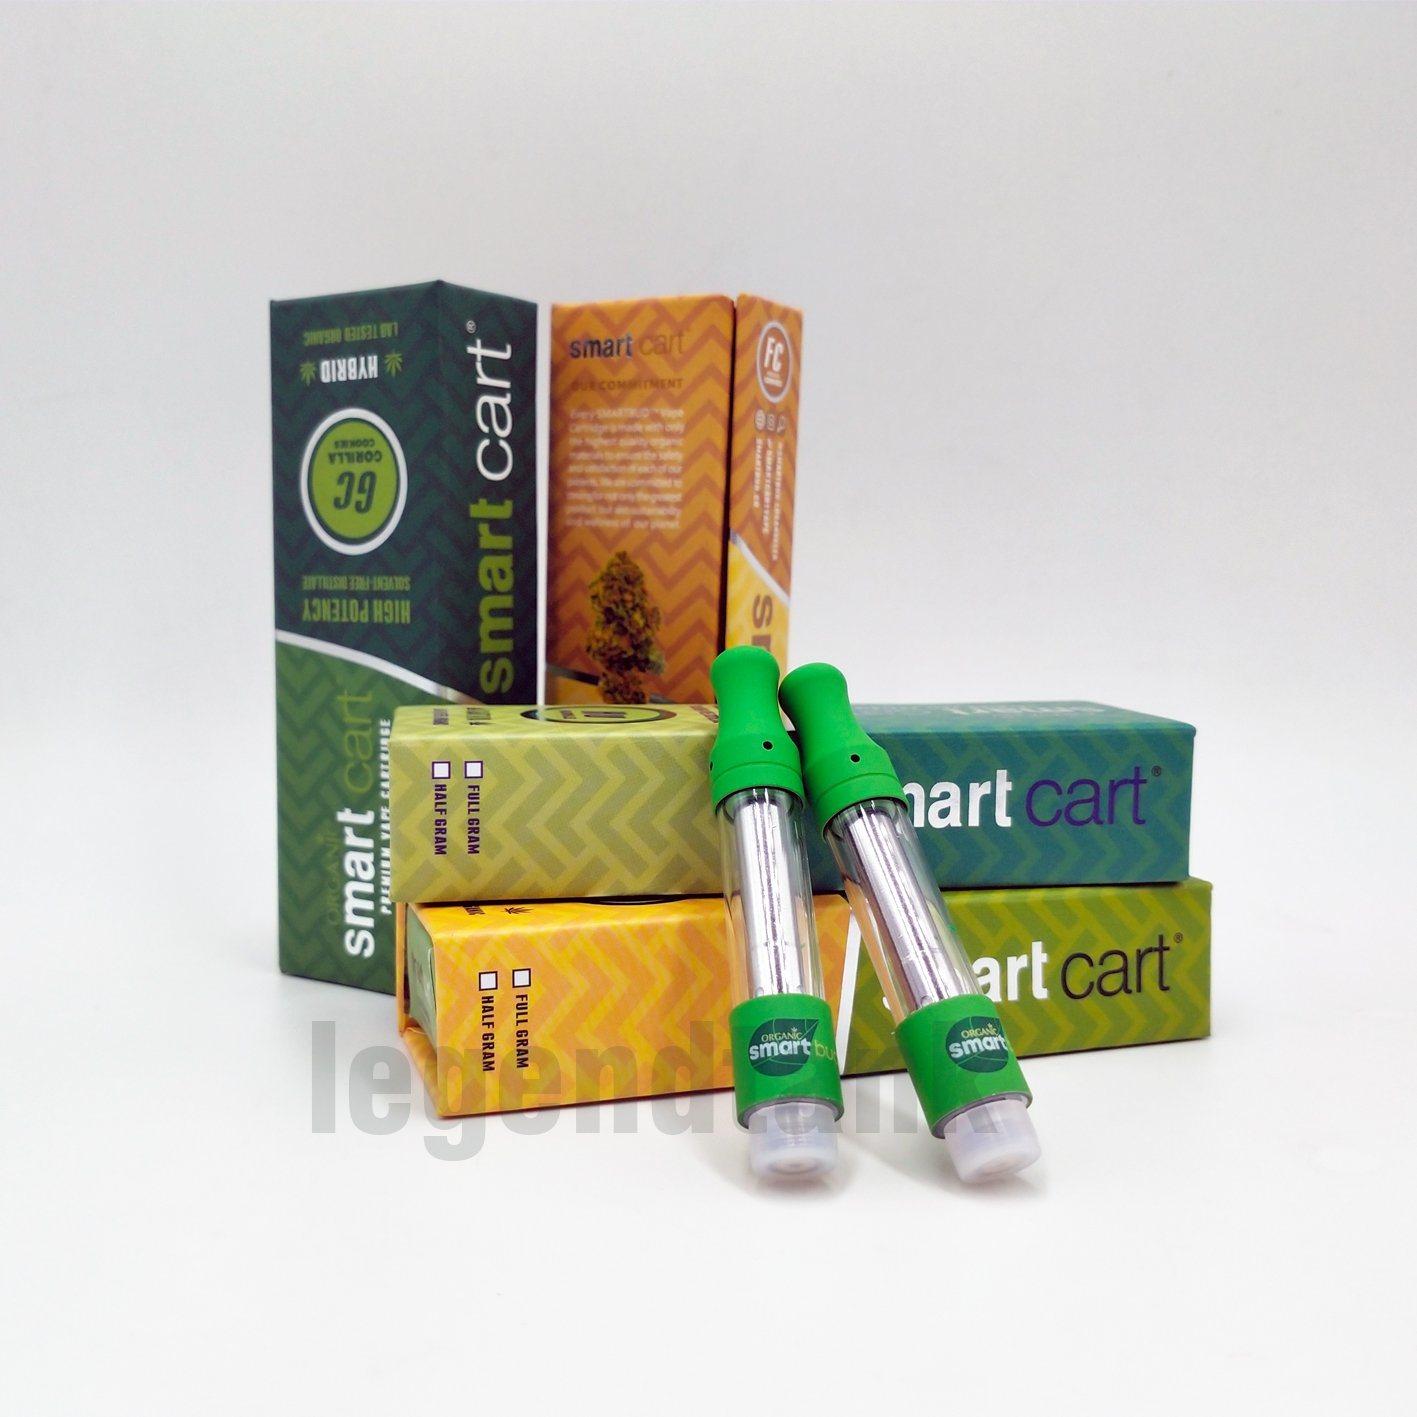 [Hot Item] Smart Bud Carts Top Air Flow 1 0 Gram 510 Thread Cartridges